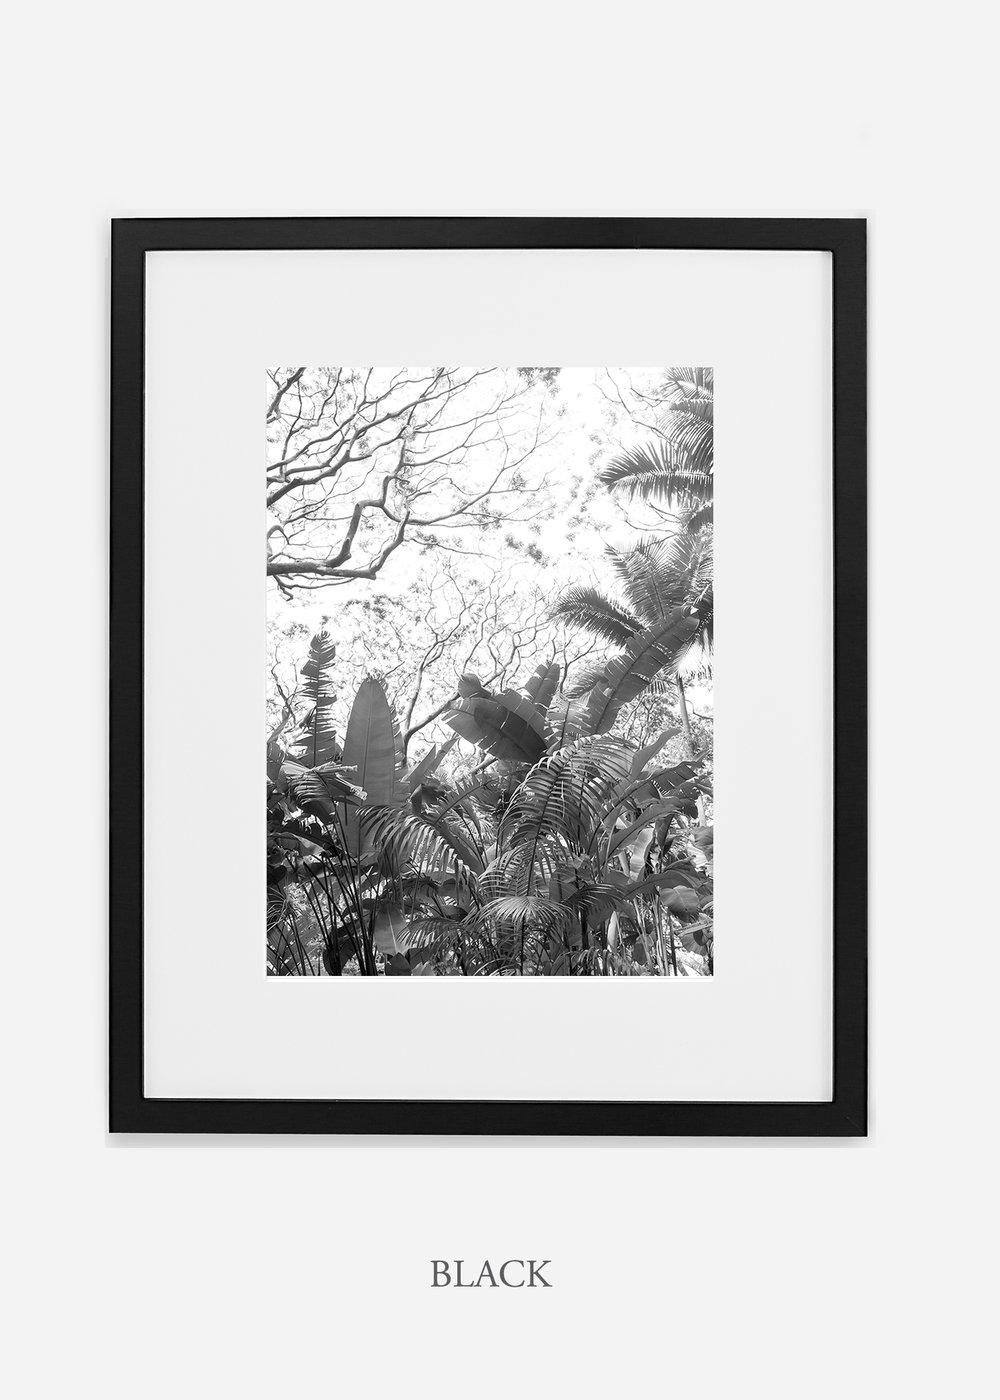 tropicaldecor_WilderCalifornia_TropicalRainforest2_Art_Photography_interiordesign_blackframe.jpg